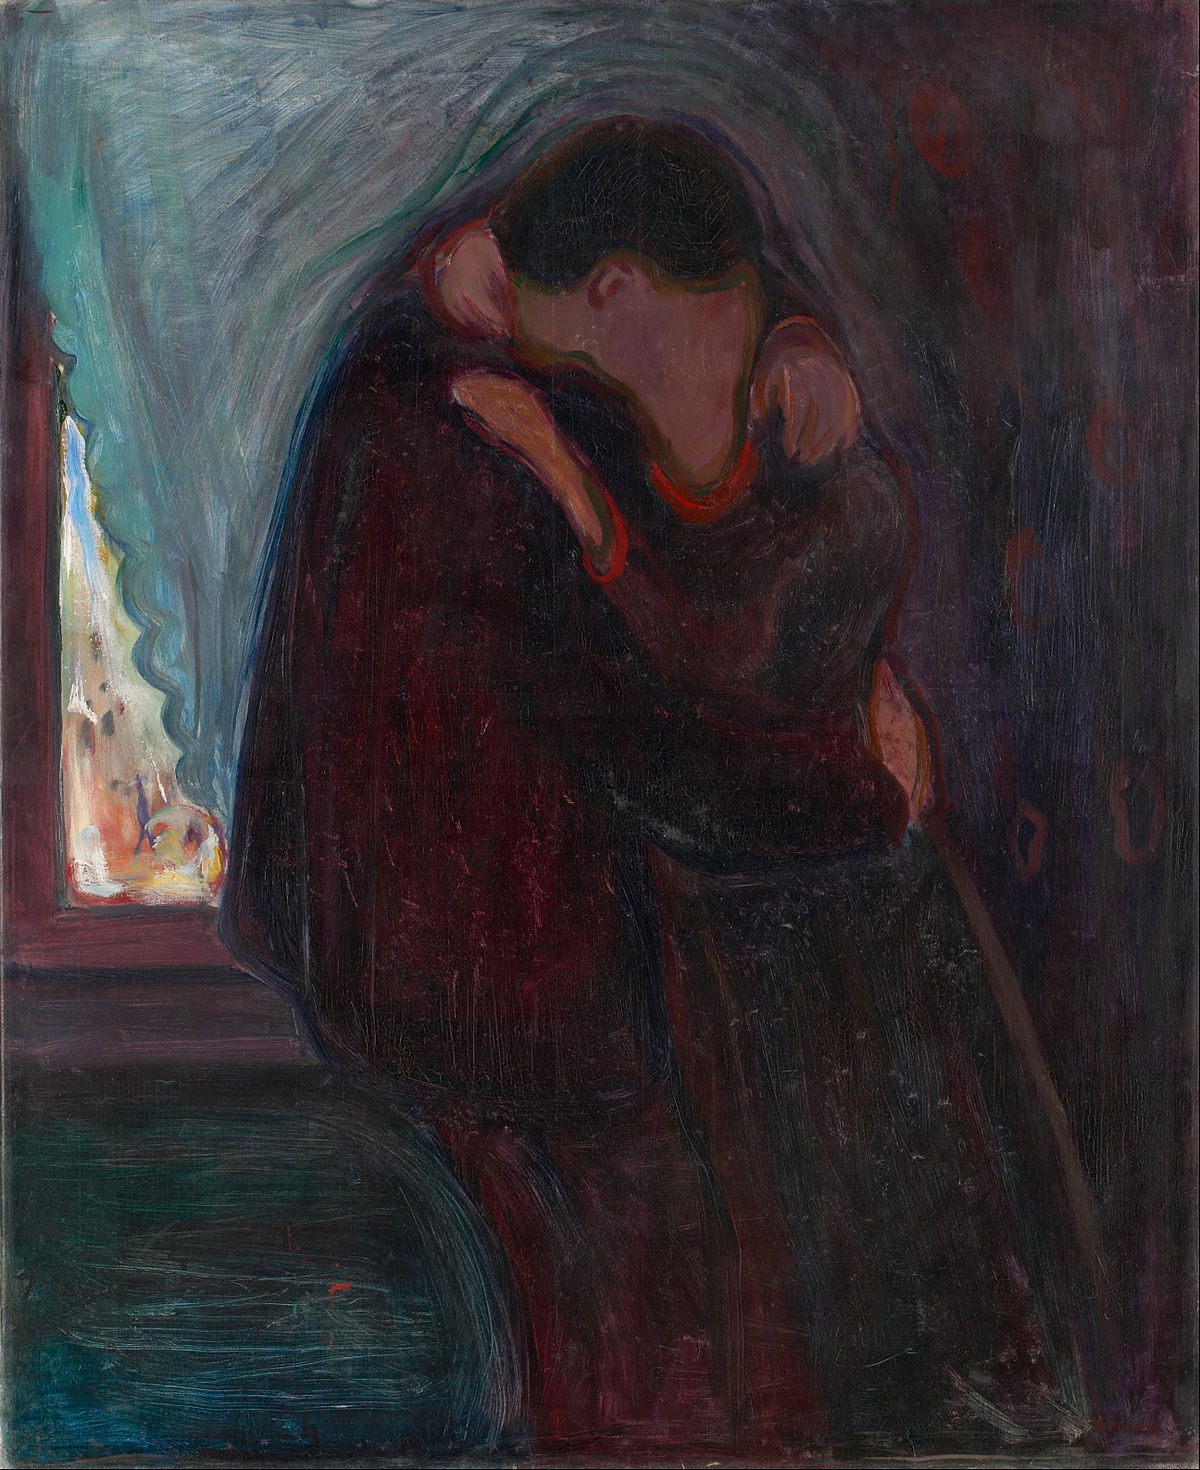 Le Baiser, Munch, 1897